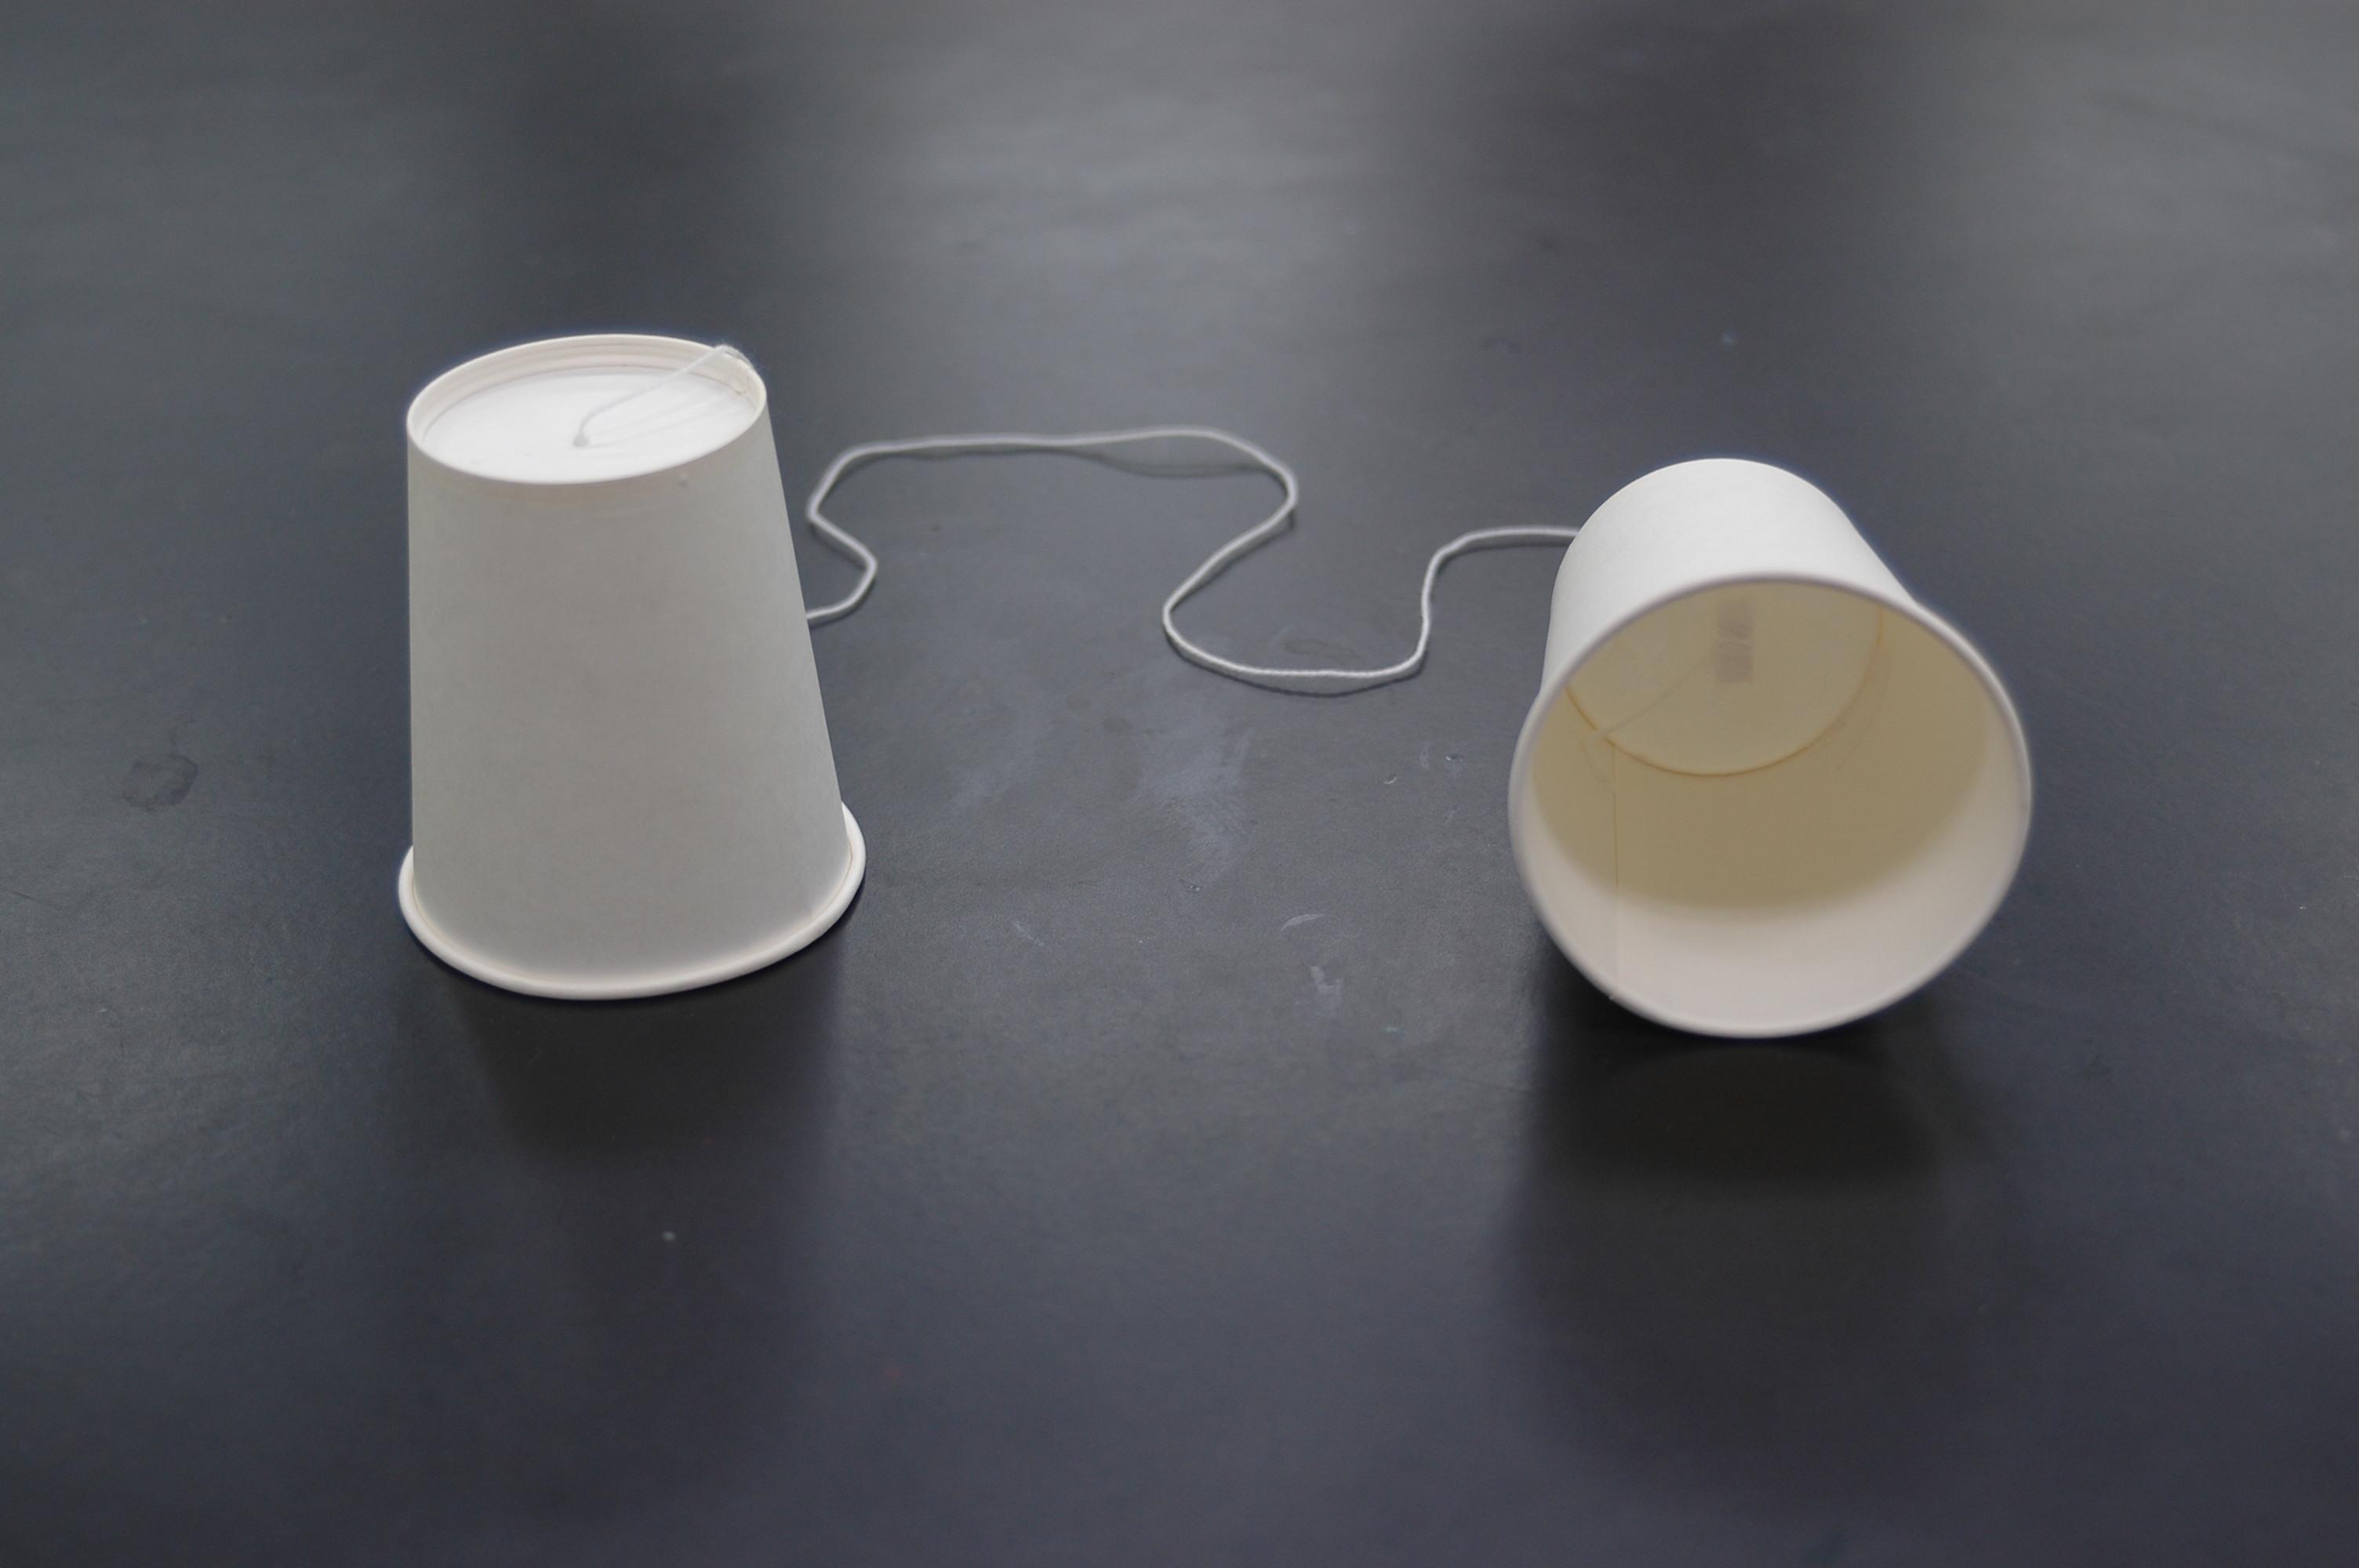 糸 電話 作り方